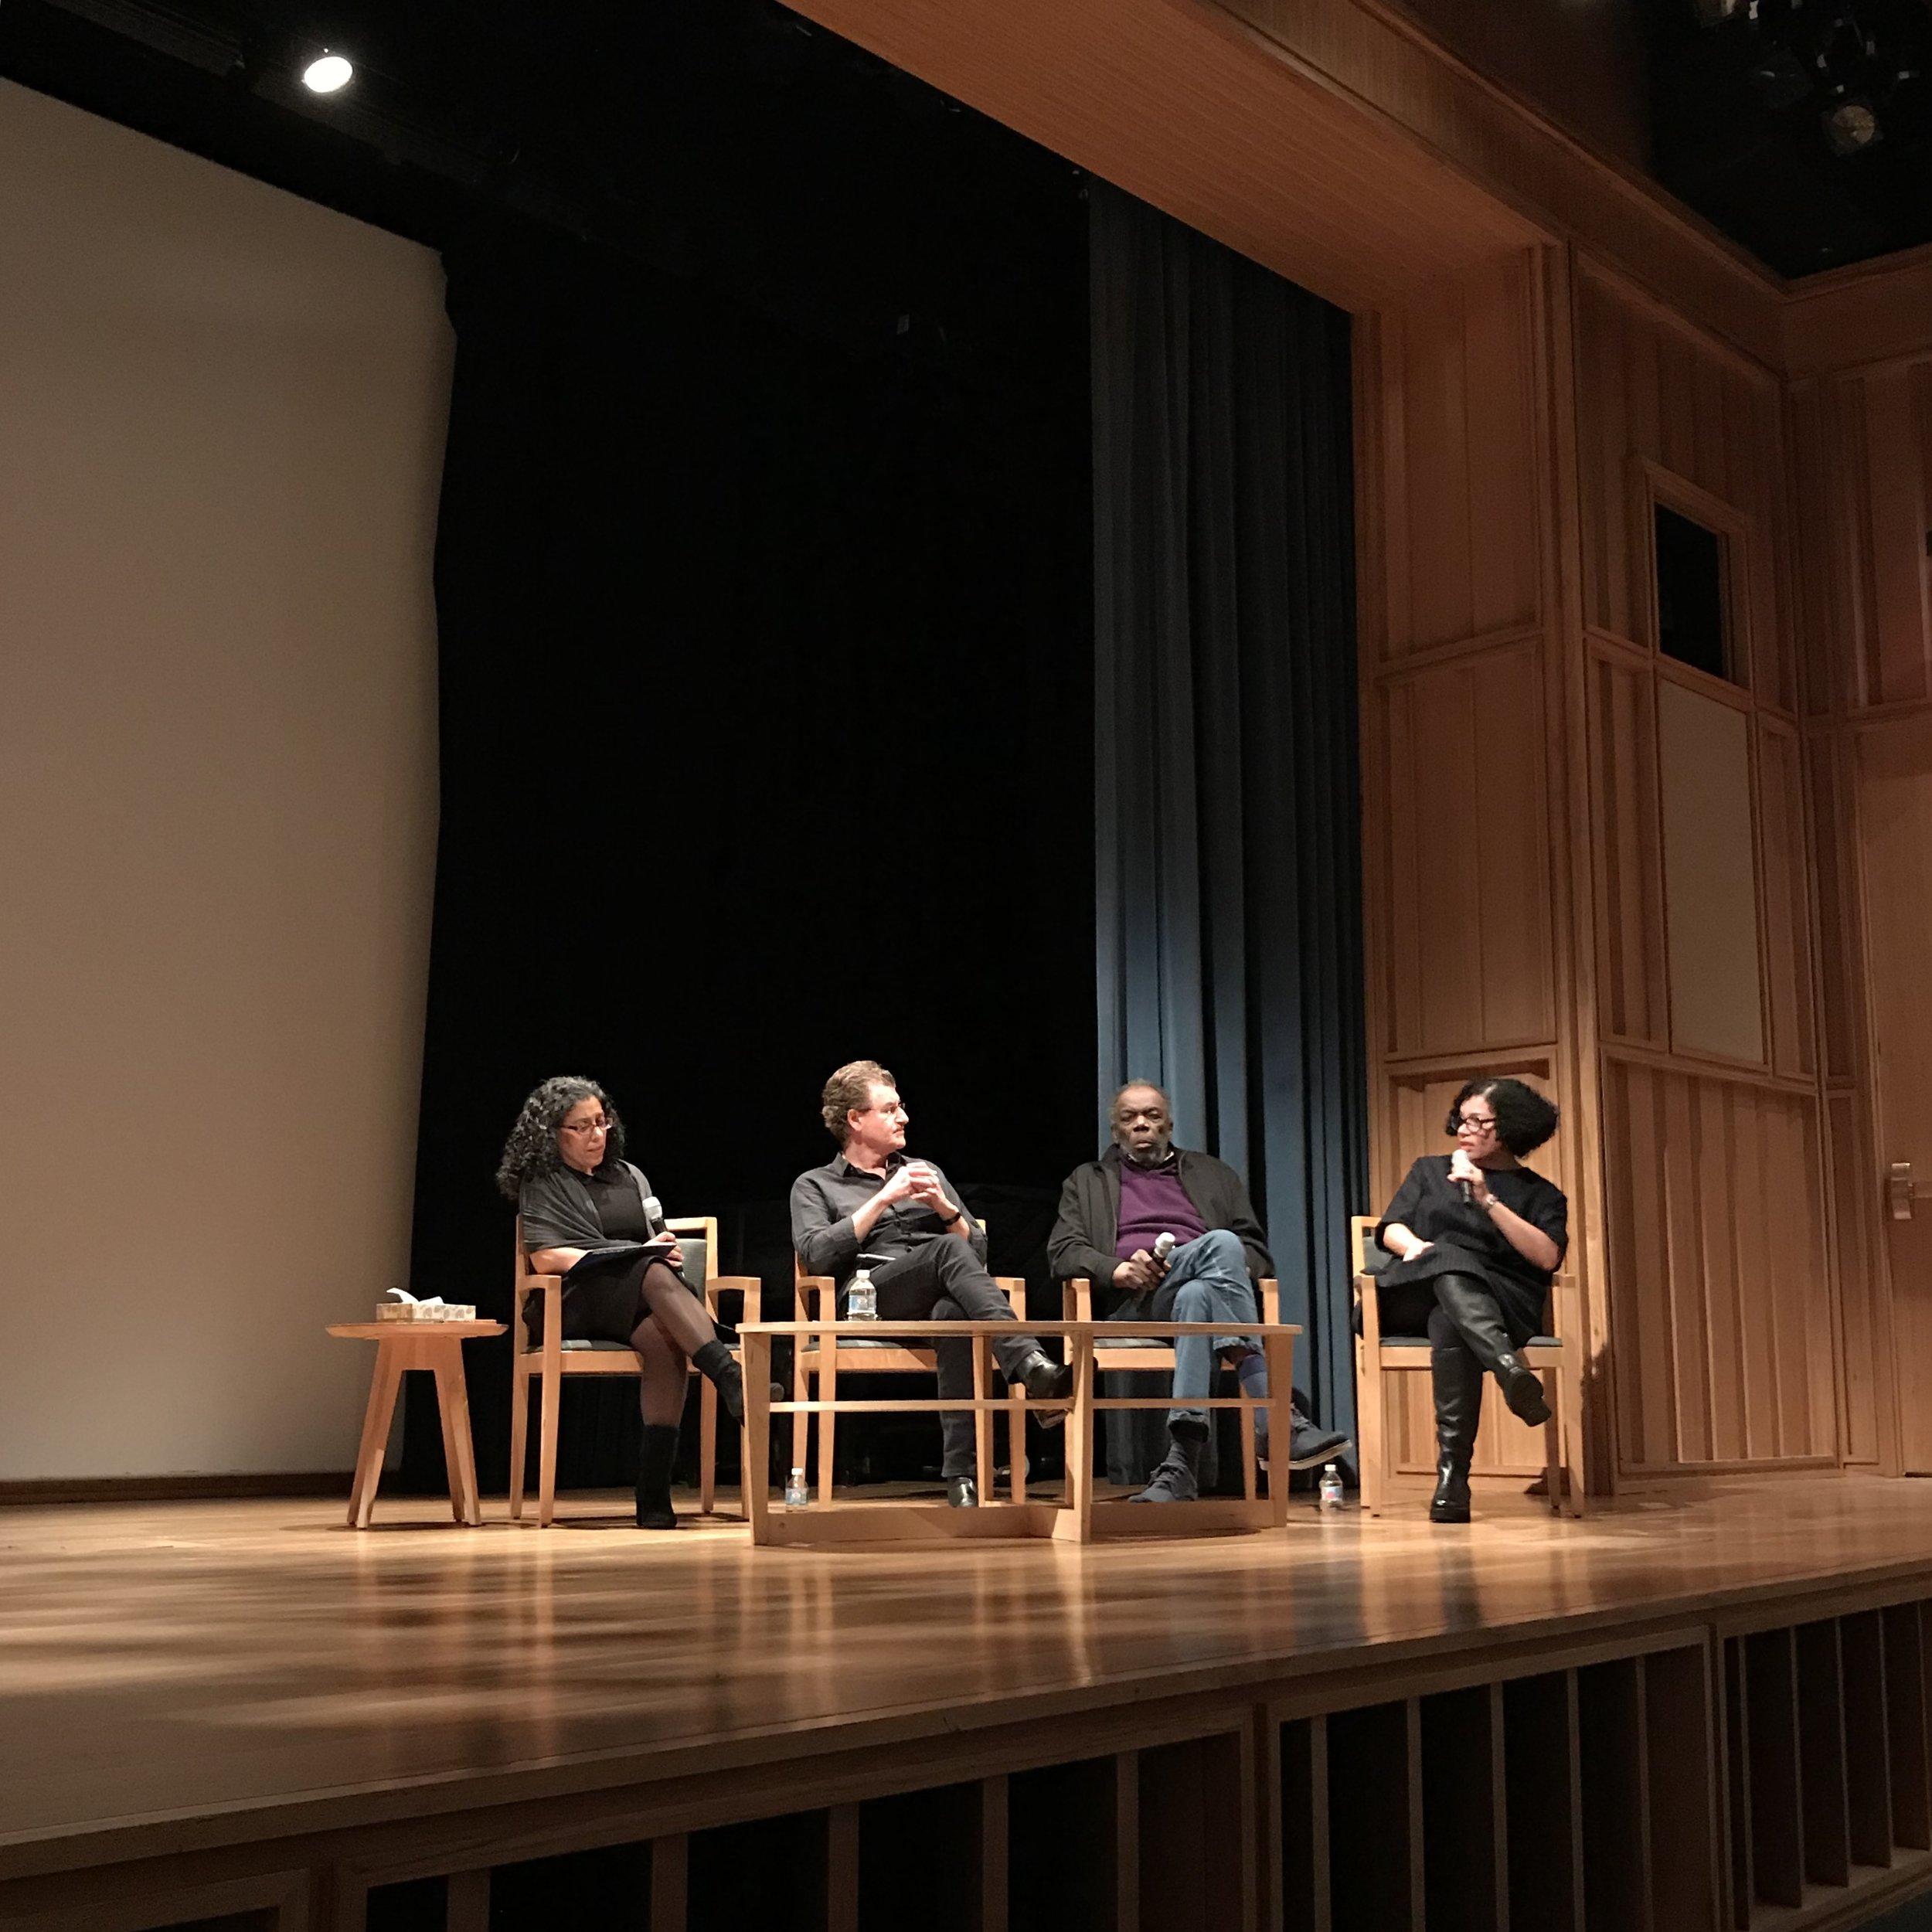 E. Carmen Ramos, Alfredo Jaar, Sam Gilliam, and Lava Thomas